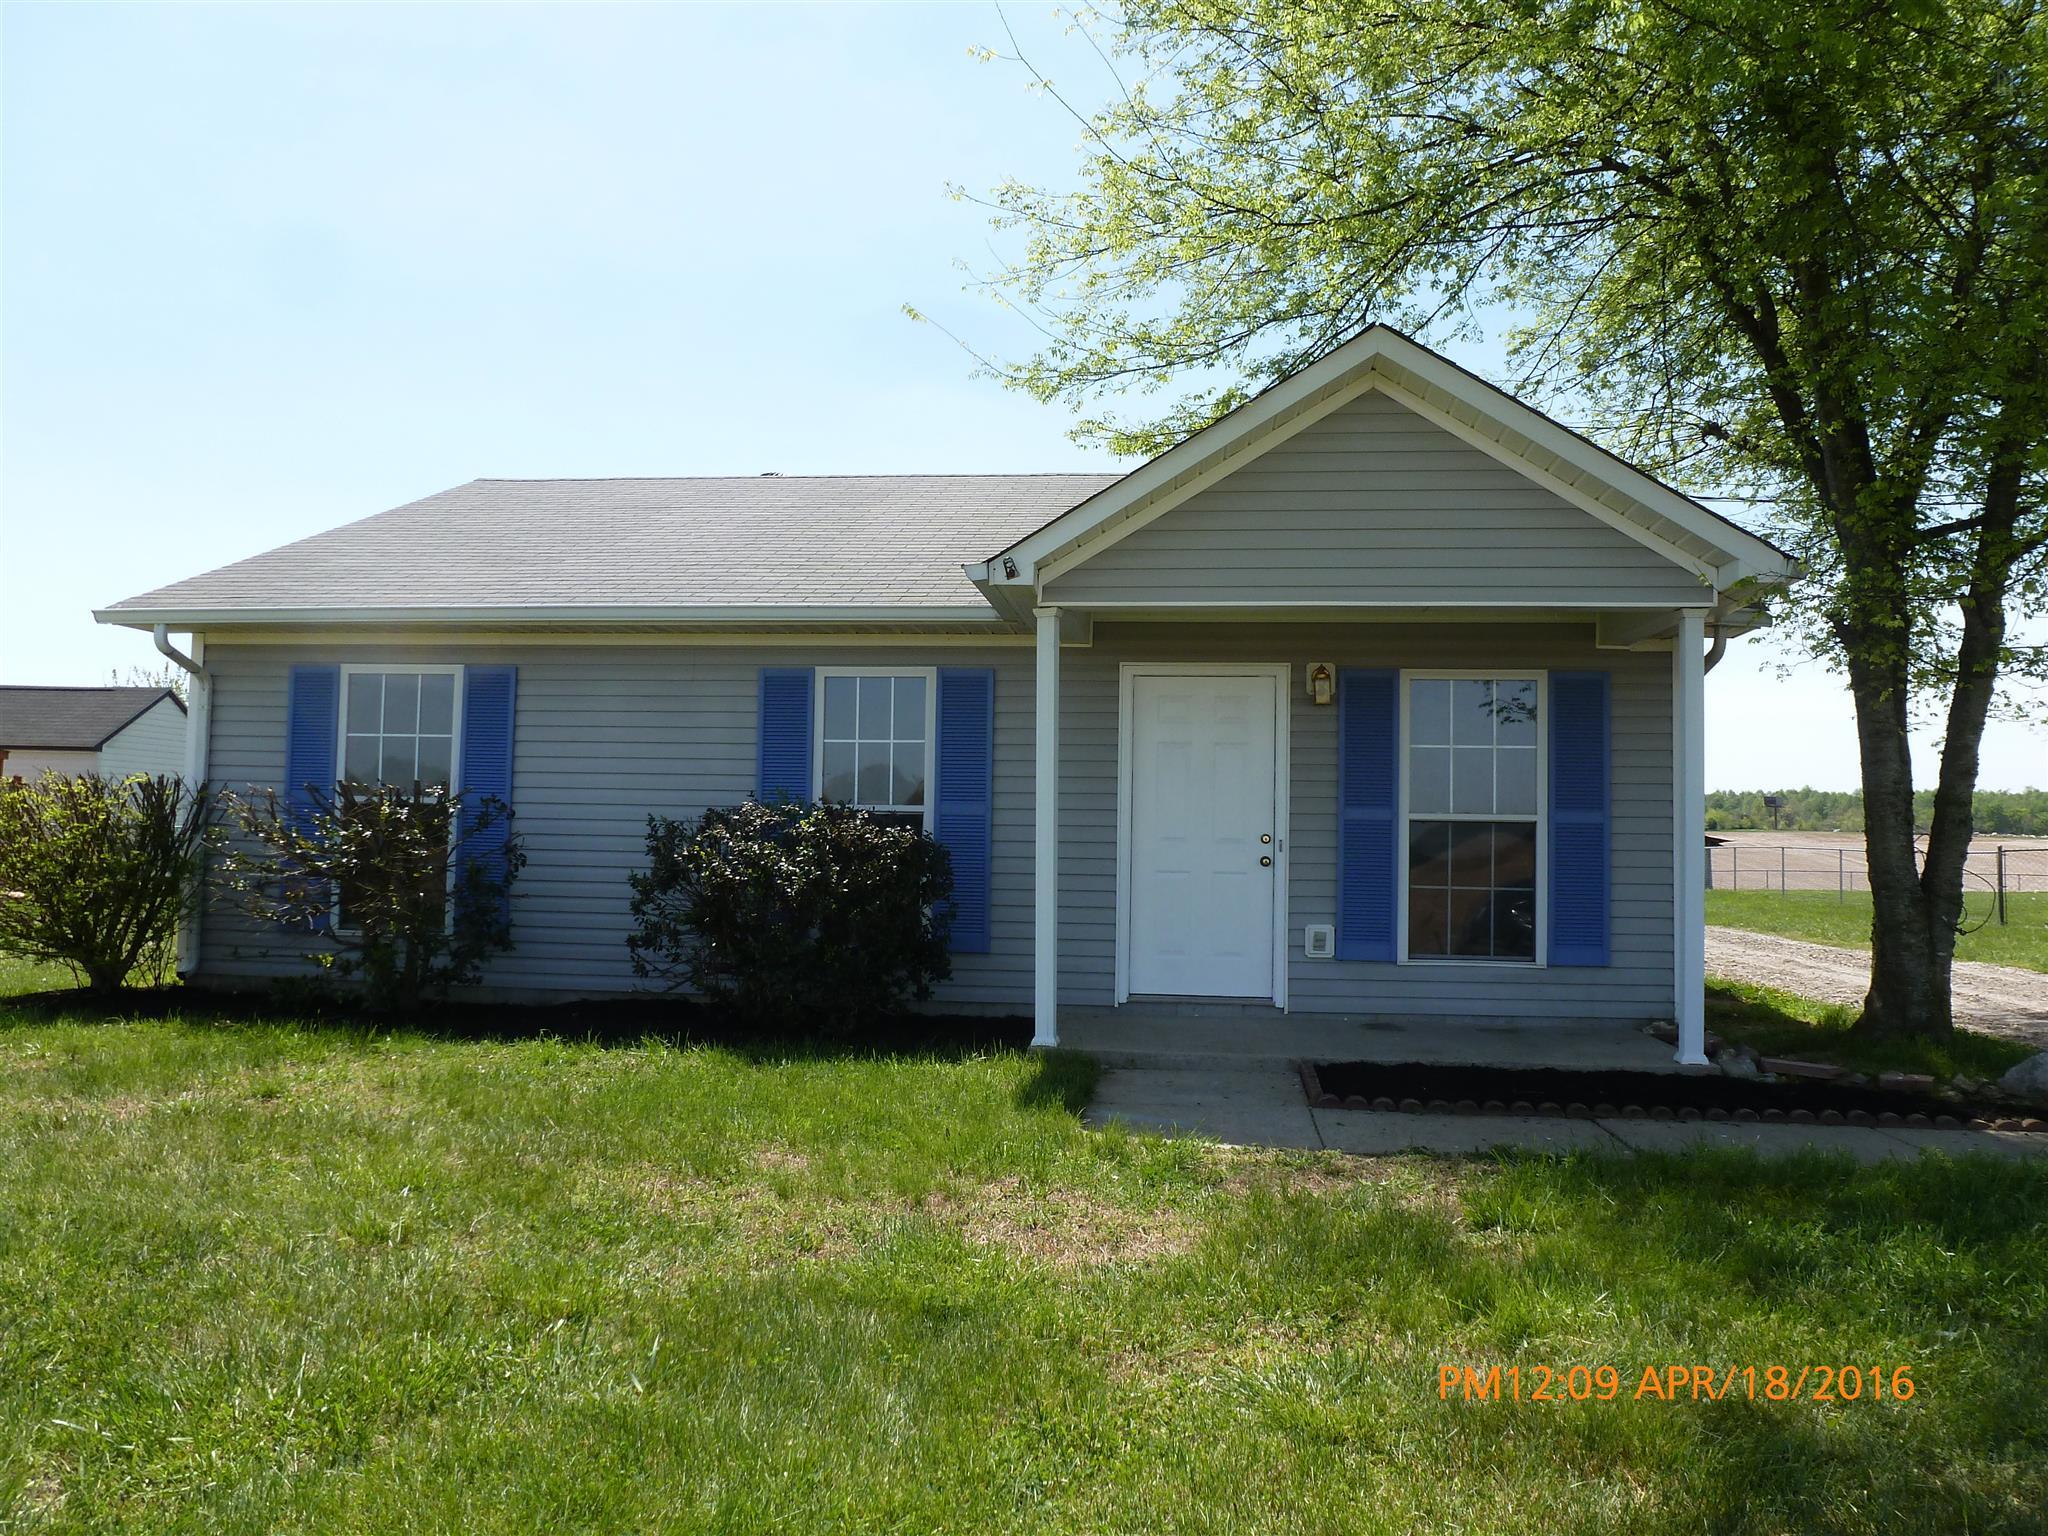 165 Bumpus Mill Rd, Oak Grove, KY 42262